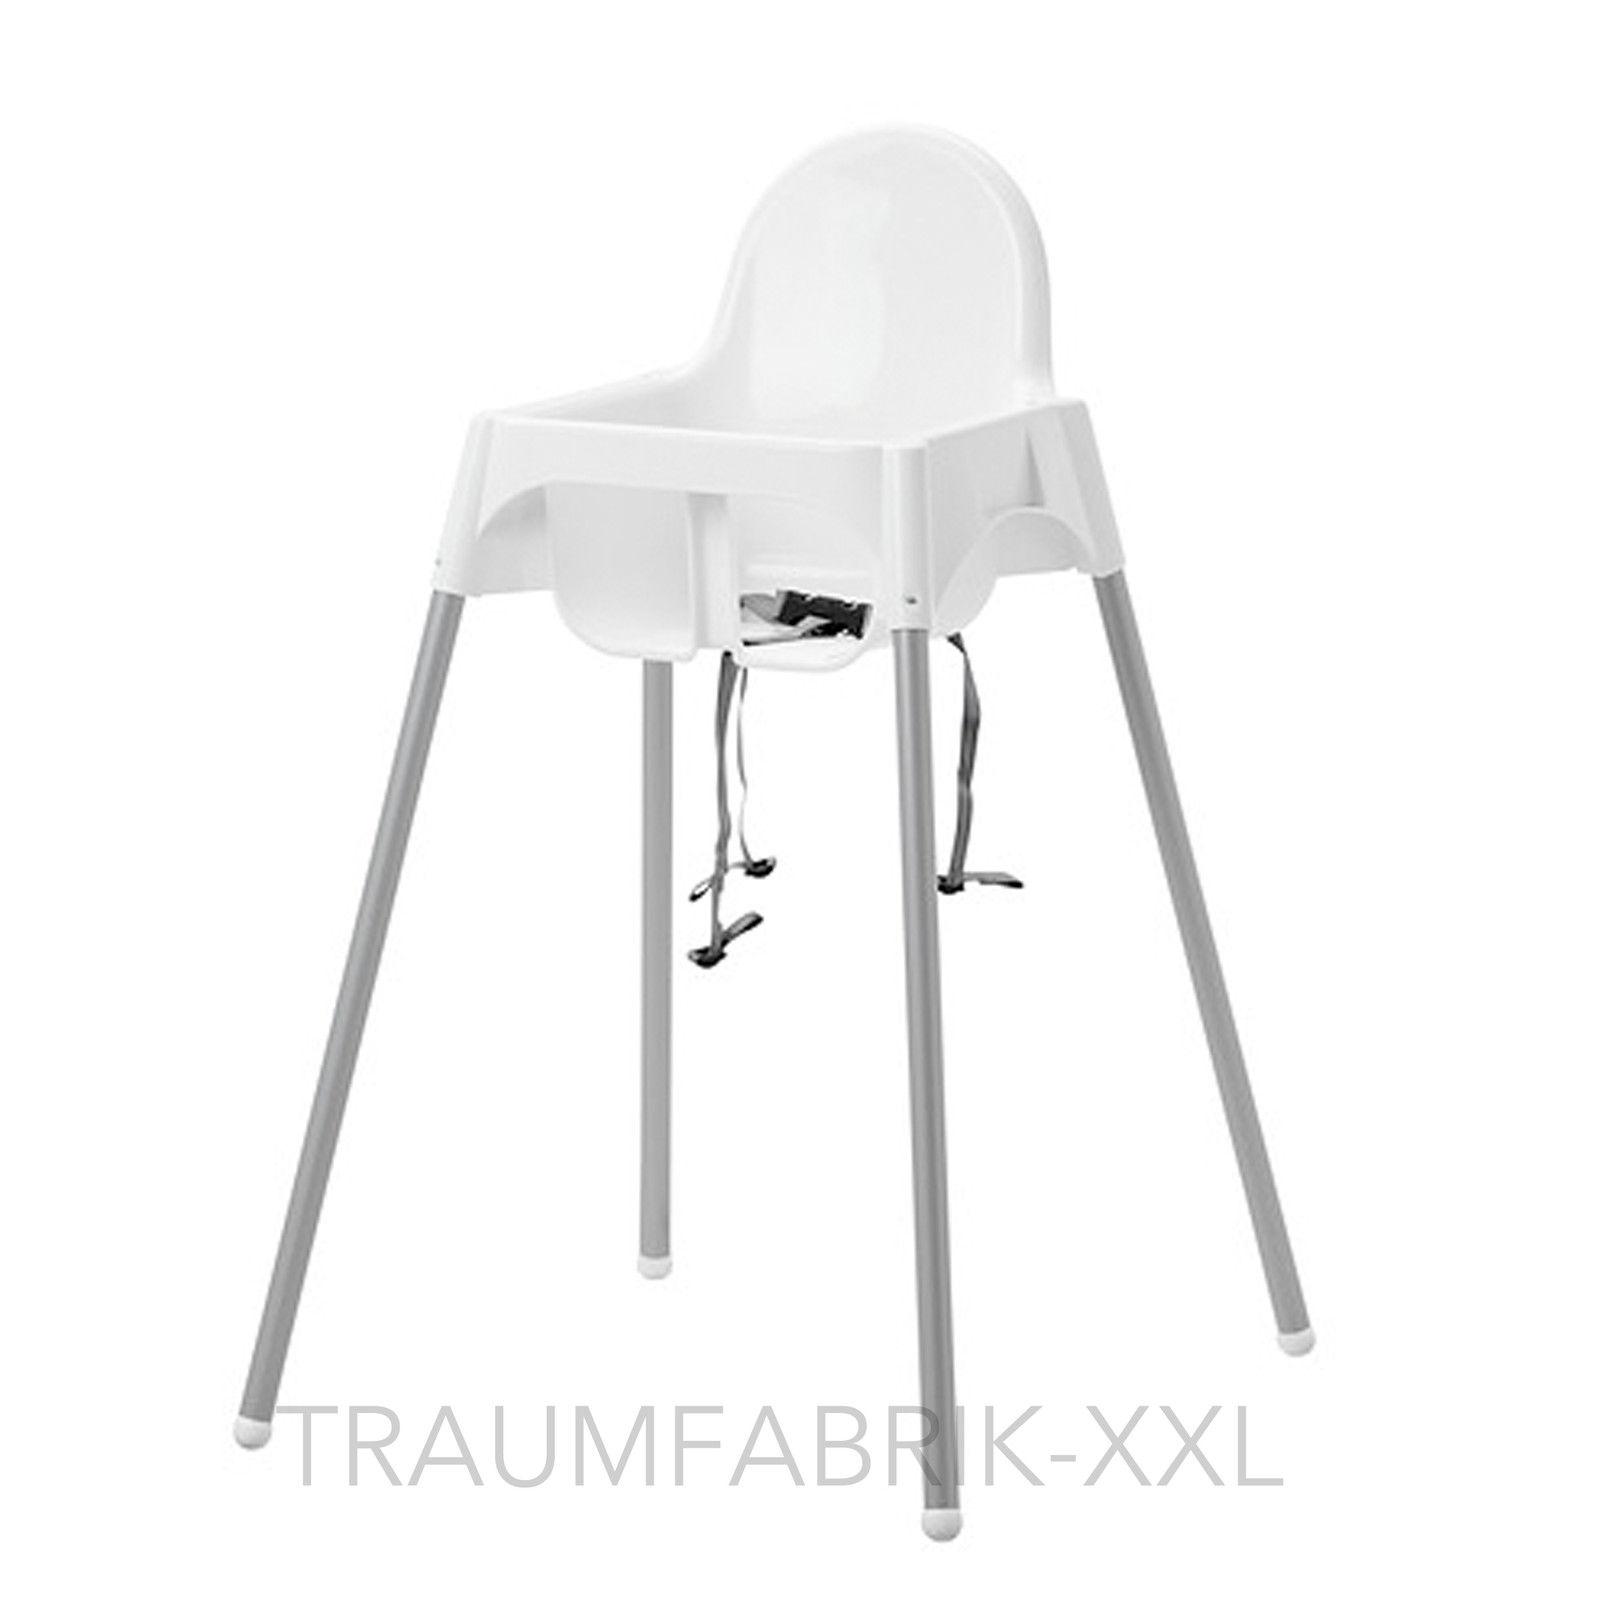 Ikea Kinderhochstuhl Weiss Hochstuhl Kindersitz Babystuhl Babysitz